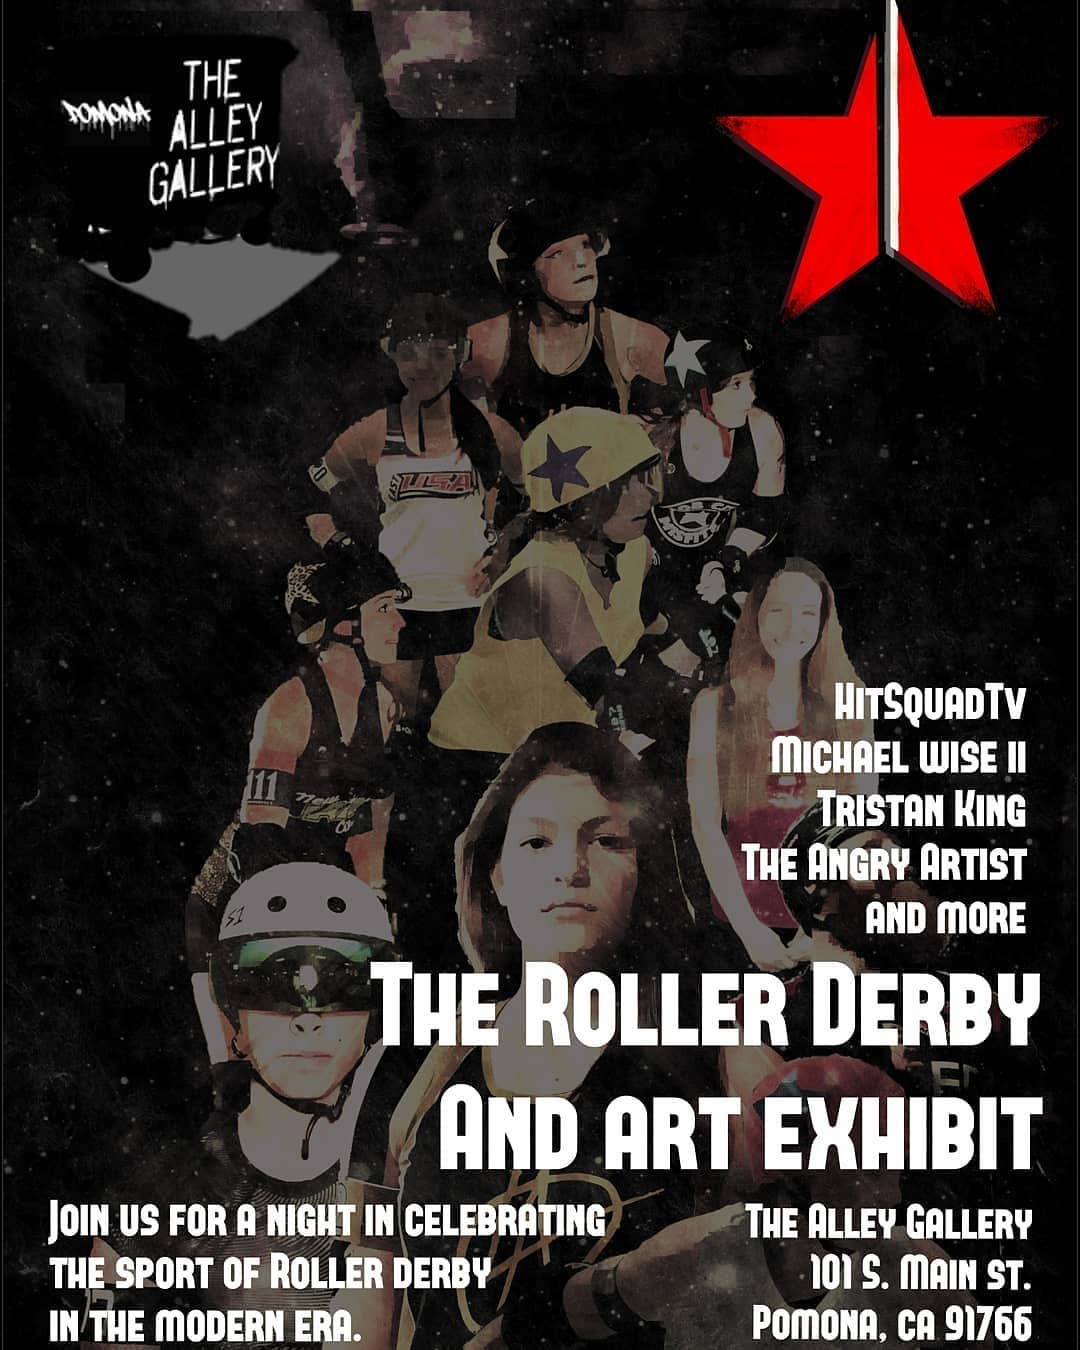 Alley Gallery flyer.jpg